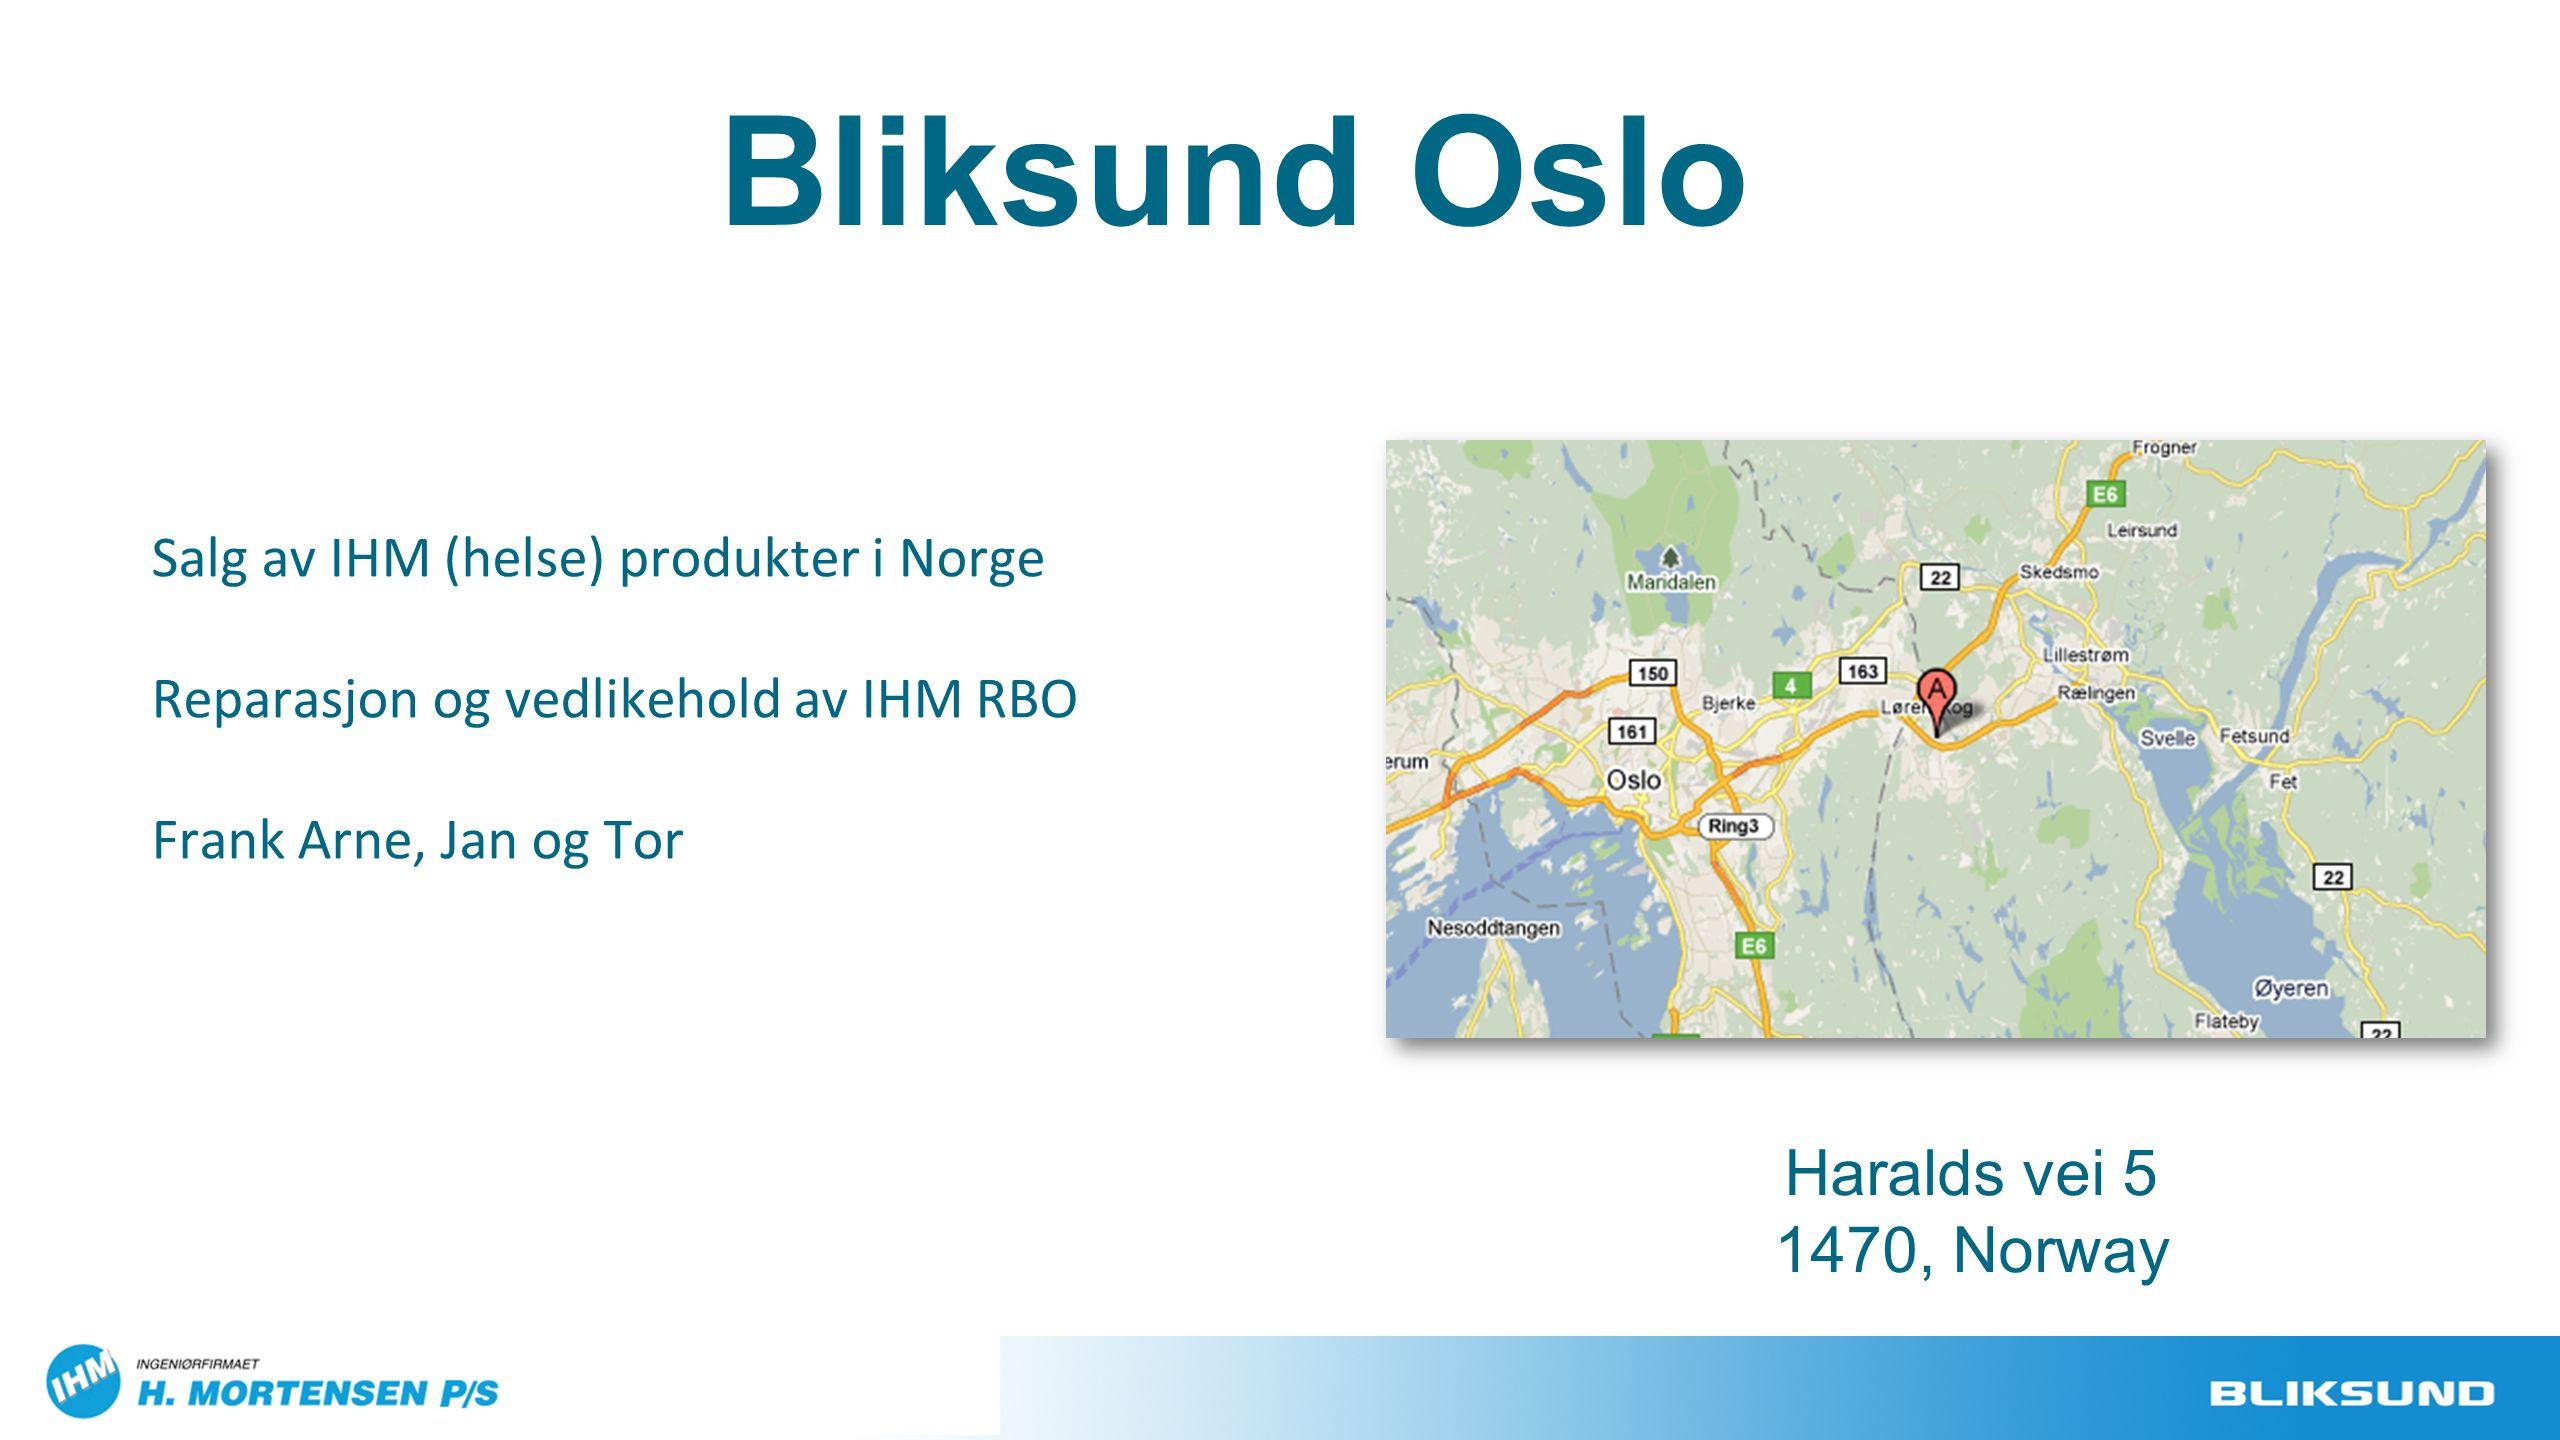 Bliksund Oslo Haralds vei 5 1470, Norway